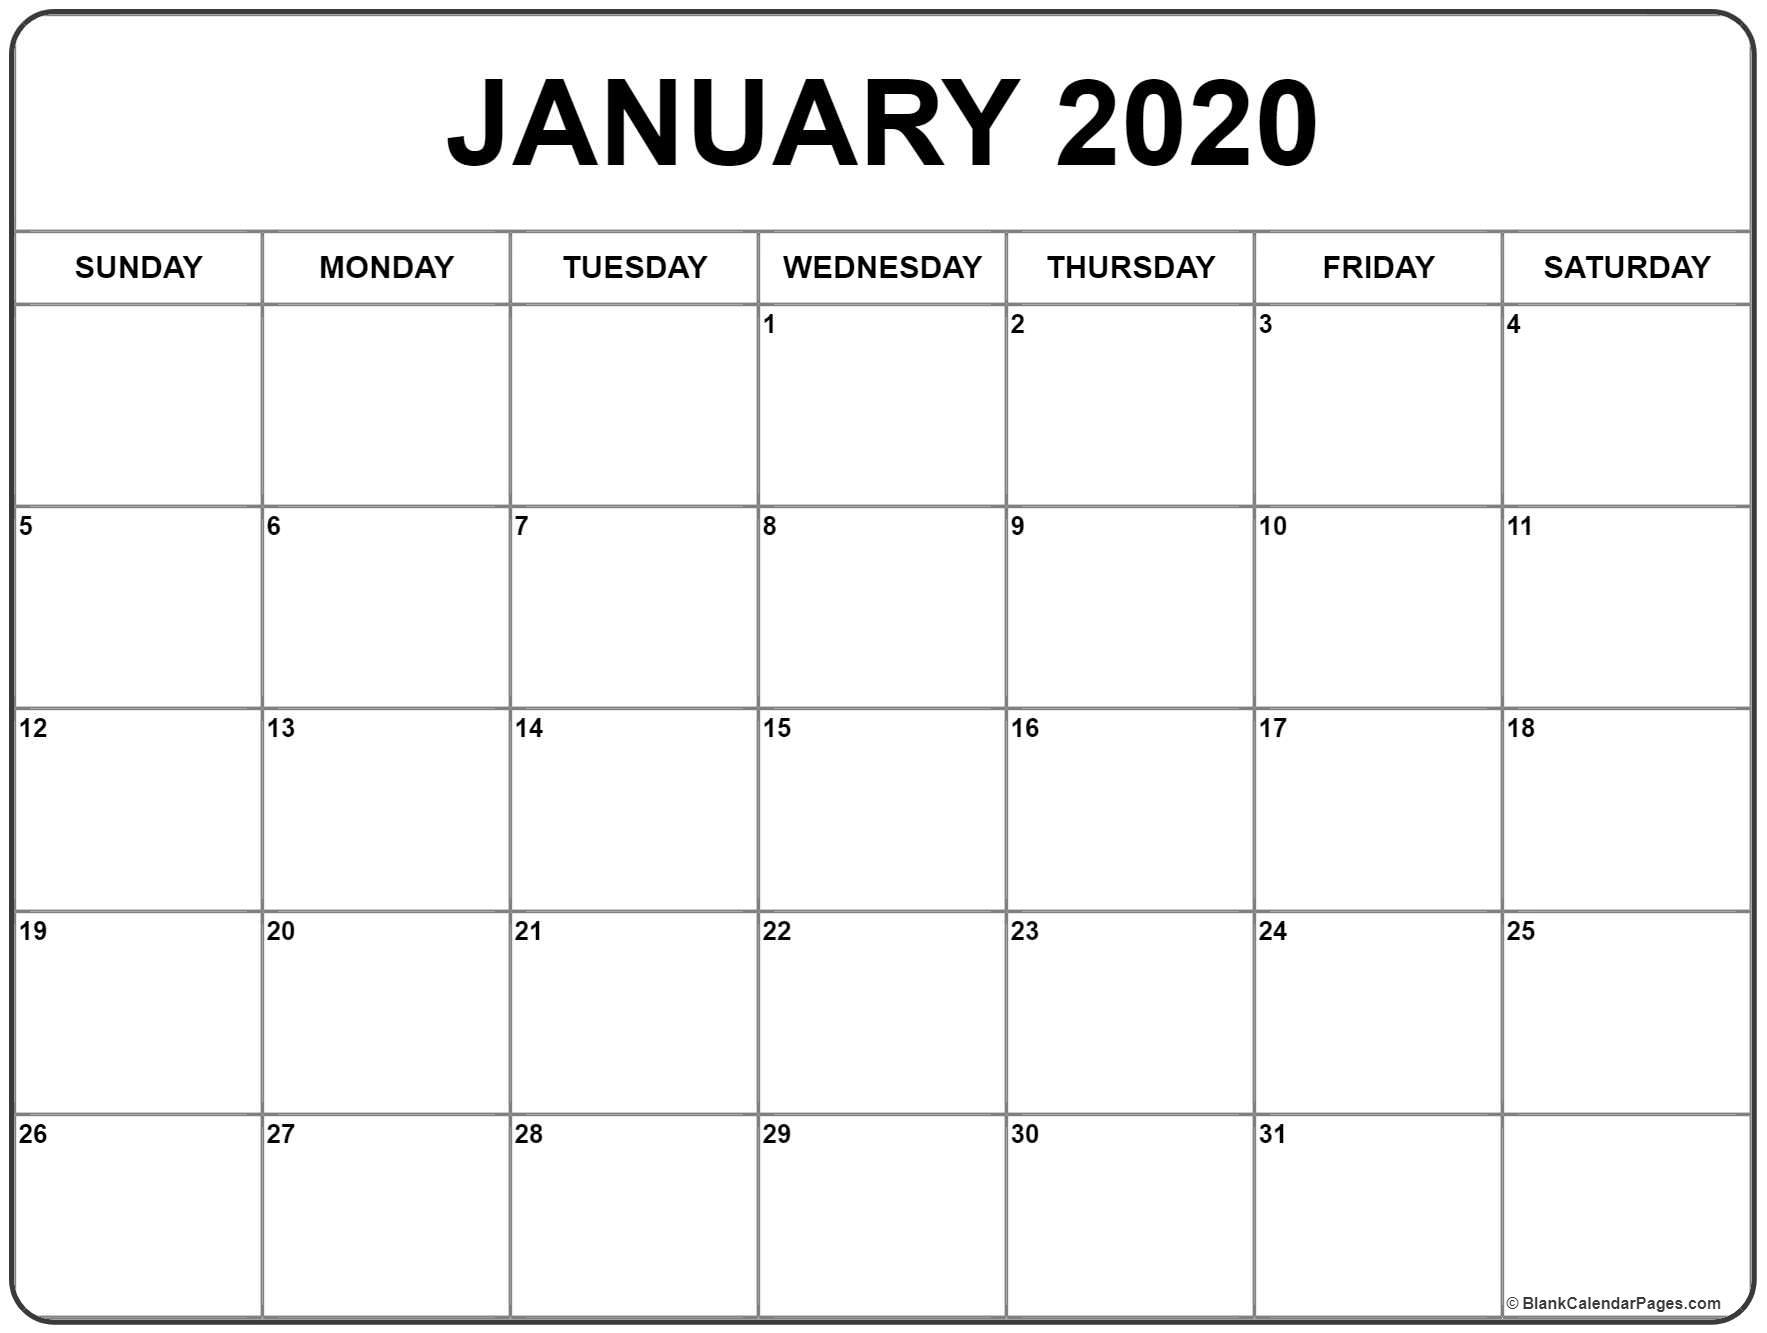 January 2020 Calendar Free Printable Monthly Calendars